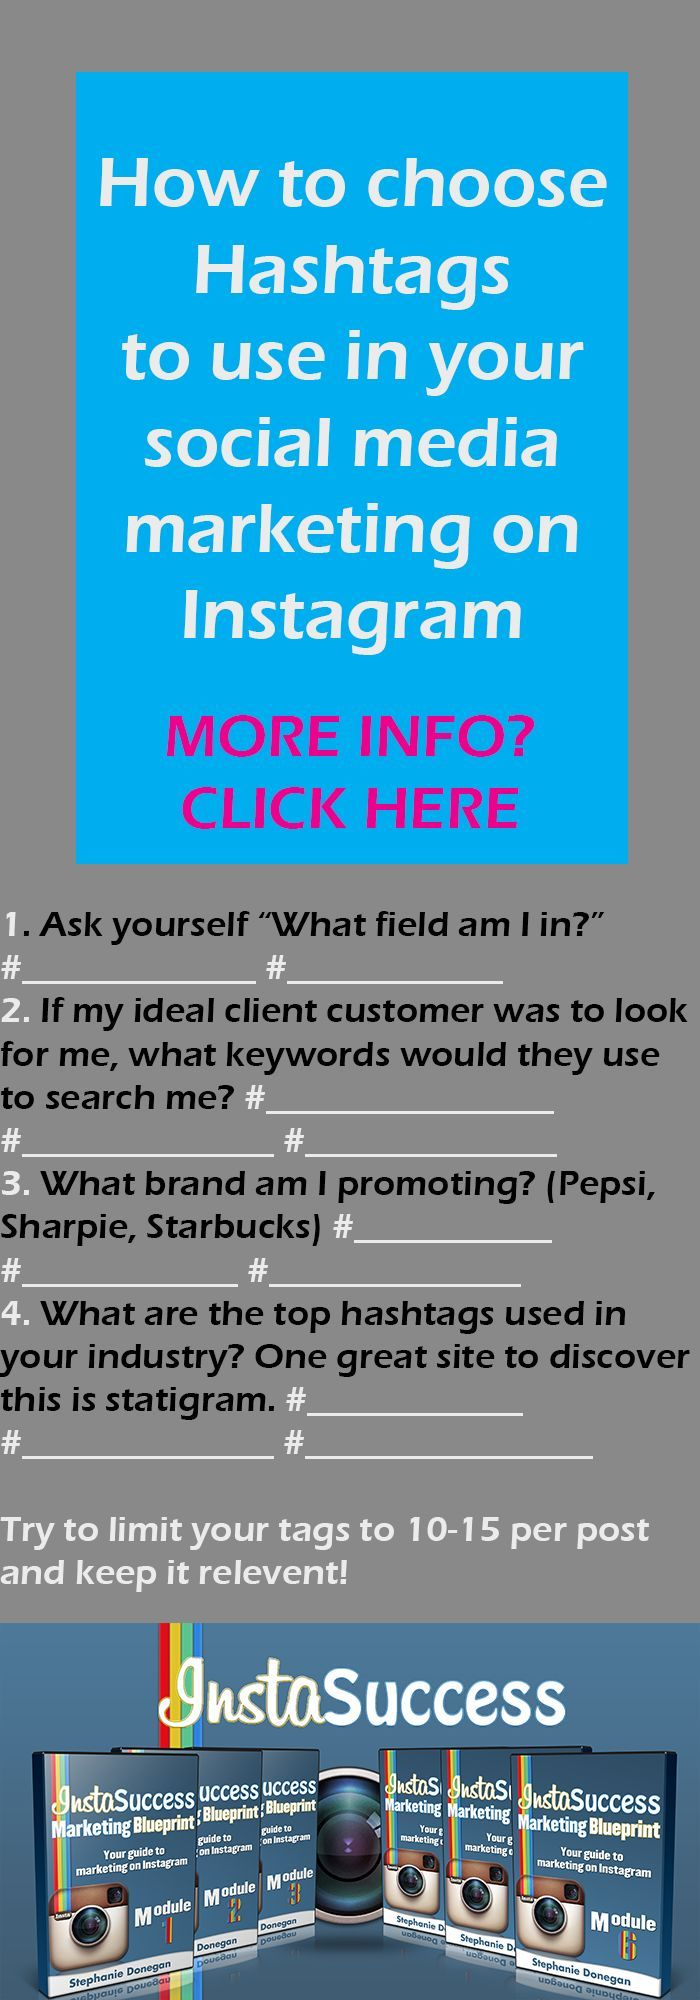 How to choose hashtags to use with your #socialmedia marketing. #instagram www.InstaSuccessMarketingBlueprint.com